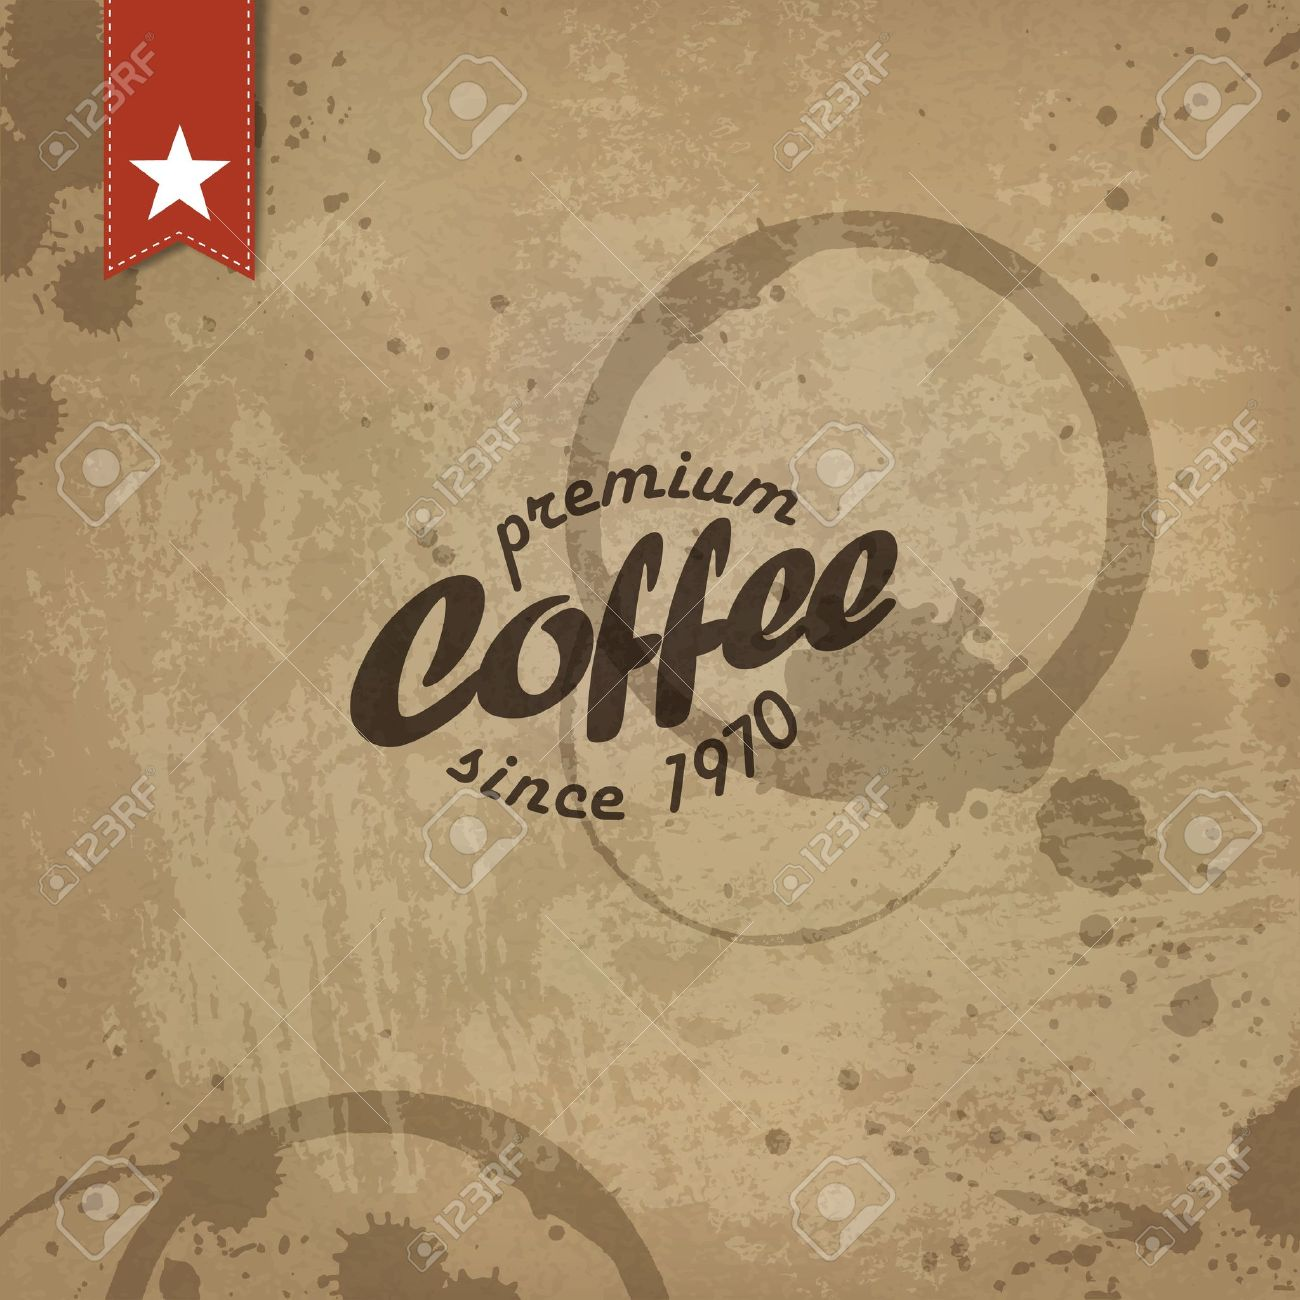 Coffee grunge retro background. - 19187491